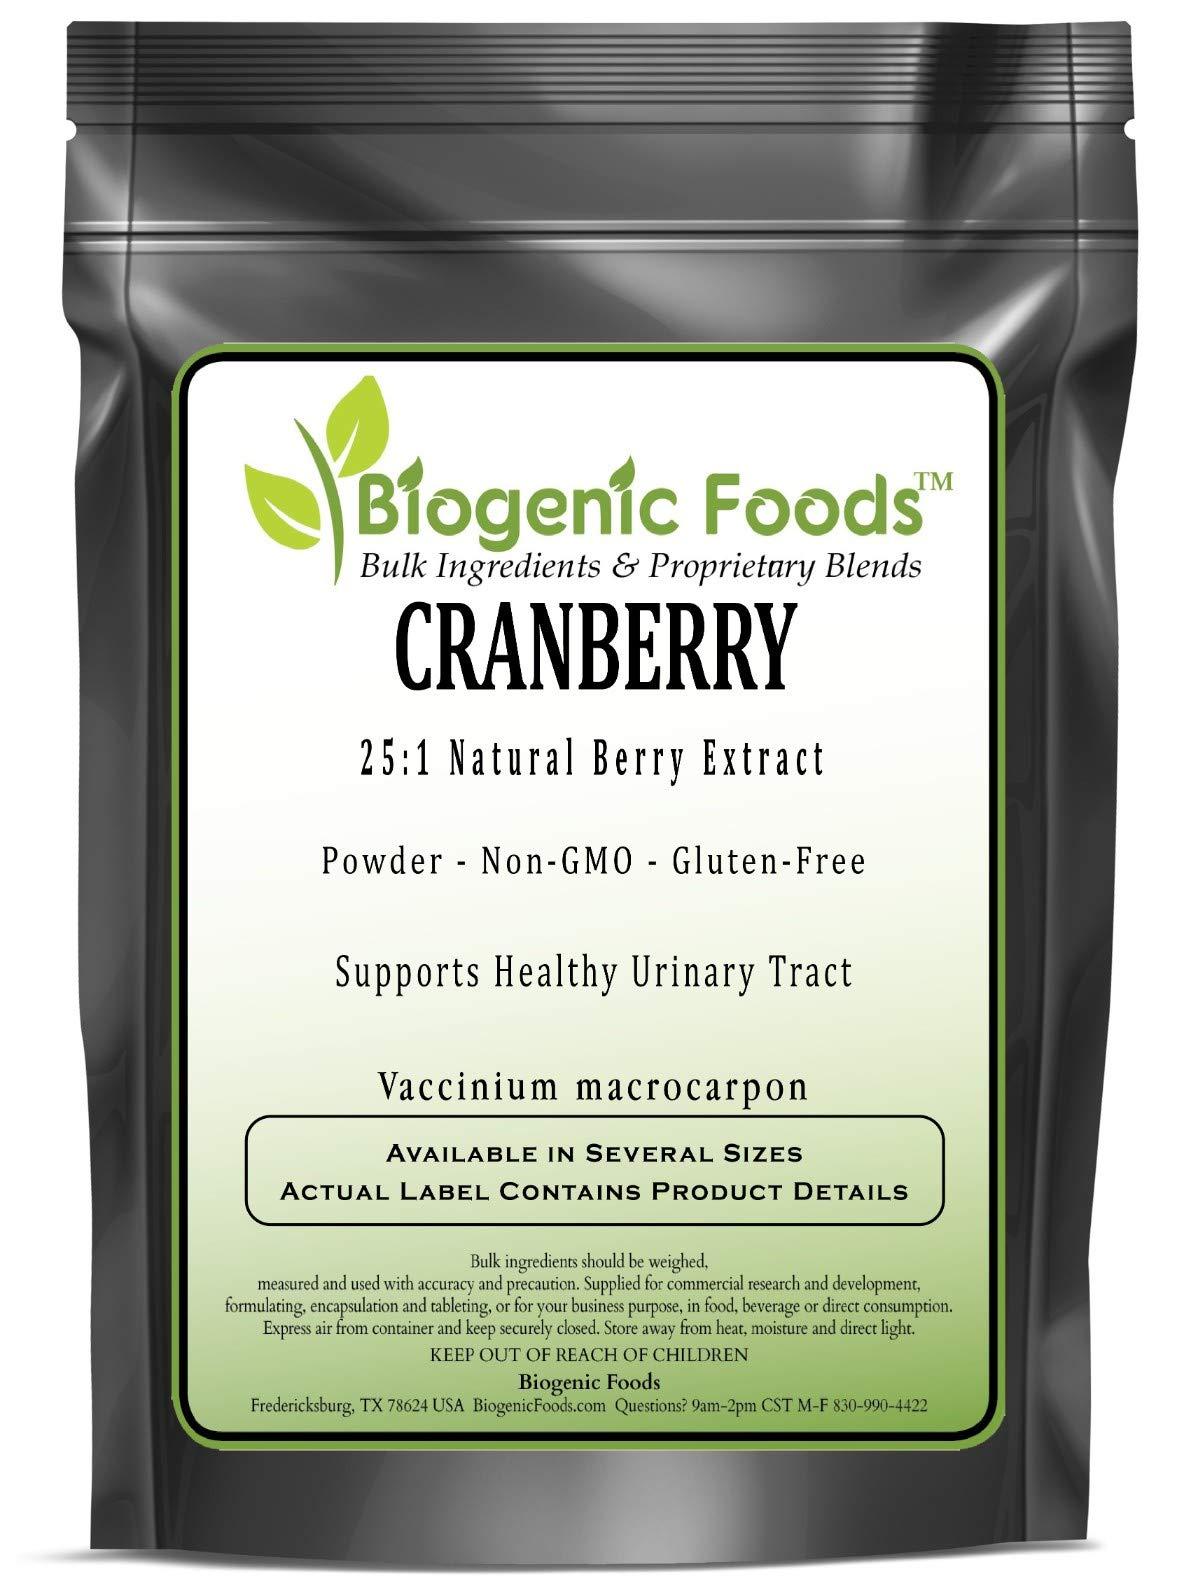 Cranberry - 25:1 Natural Berry Powder Extract (Vaccinium macrocarpon), 1 kg